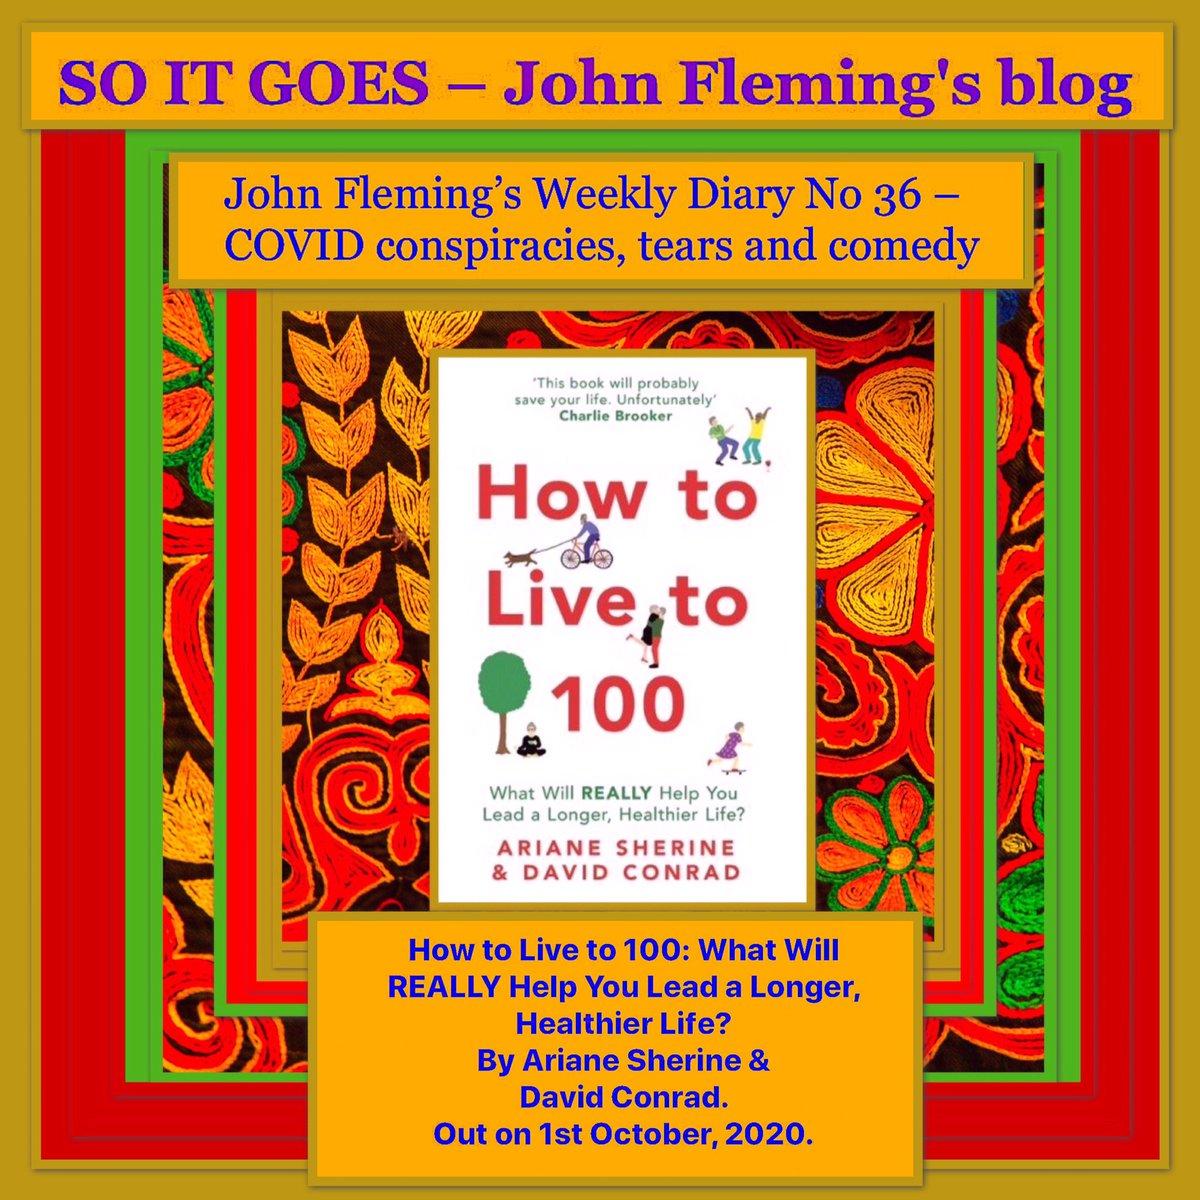 #COVID conspiracies, #comedy & tears - John Fleming's Weekly Diary No 36.  #thejohnfleming #blog  #shadwell #limehouse #isleofdogs #eastlondon #towerhamlets #canningtown #newham #plaistow #nyc #arianesherine #davidconrad #davidconraduk #HowToLiveTo100   https://t.co/9WJbwmIHM0 https://t.co/xS6O9R5kAE